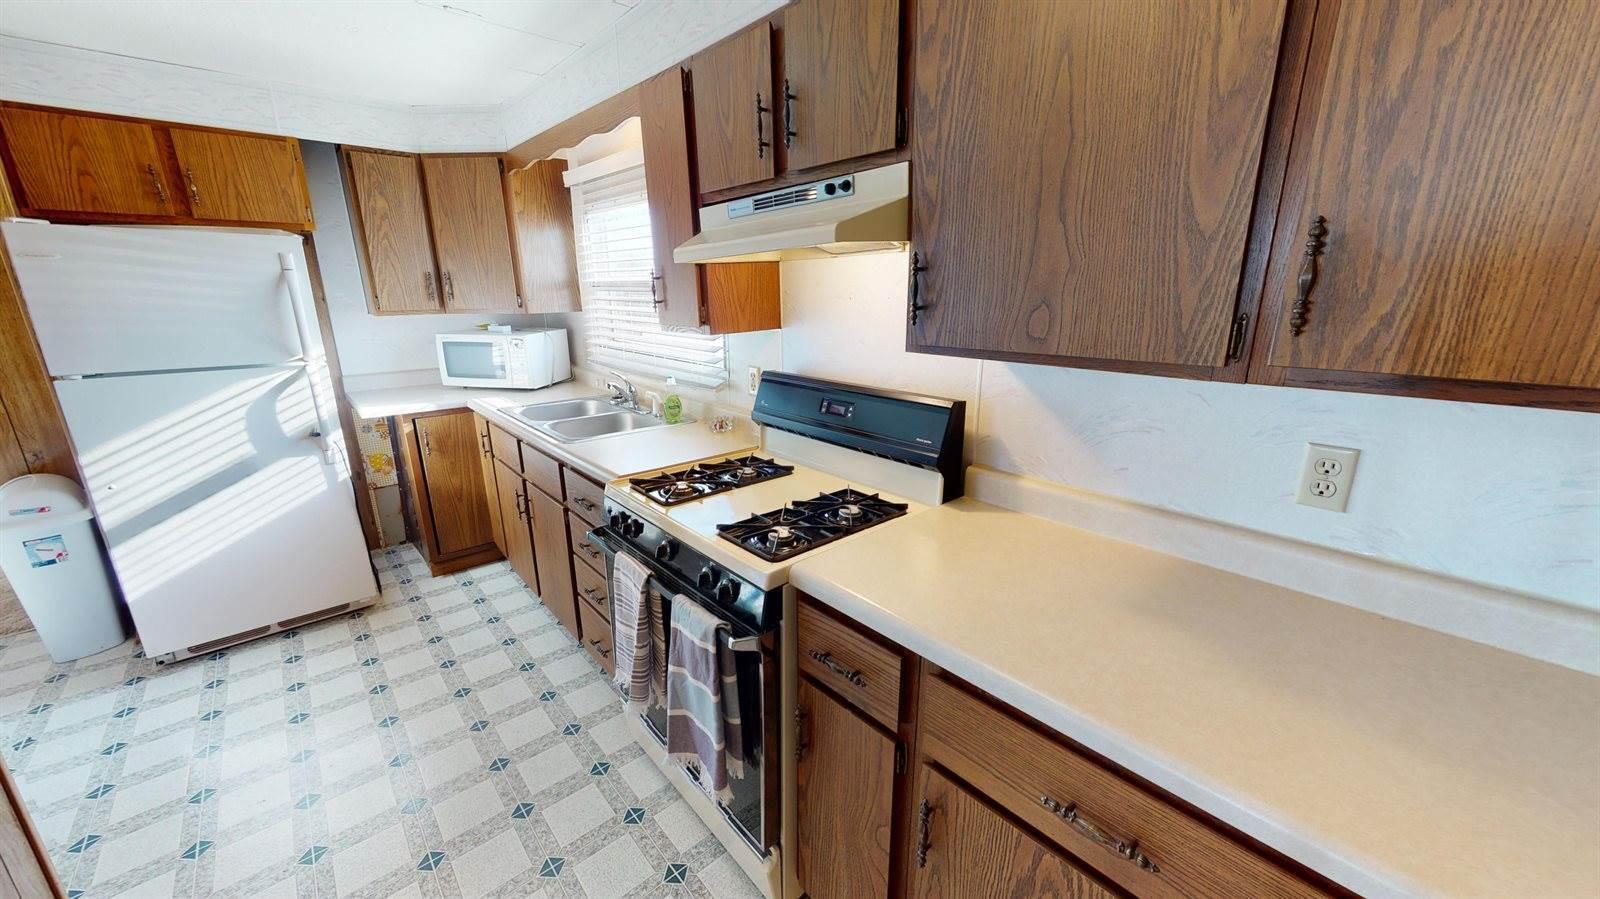 830 46th Avenue NW, Lot 5, Hazen, ND 58545